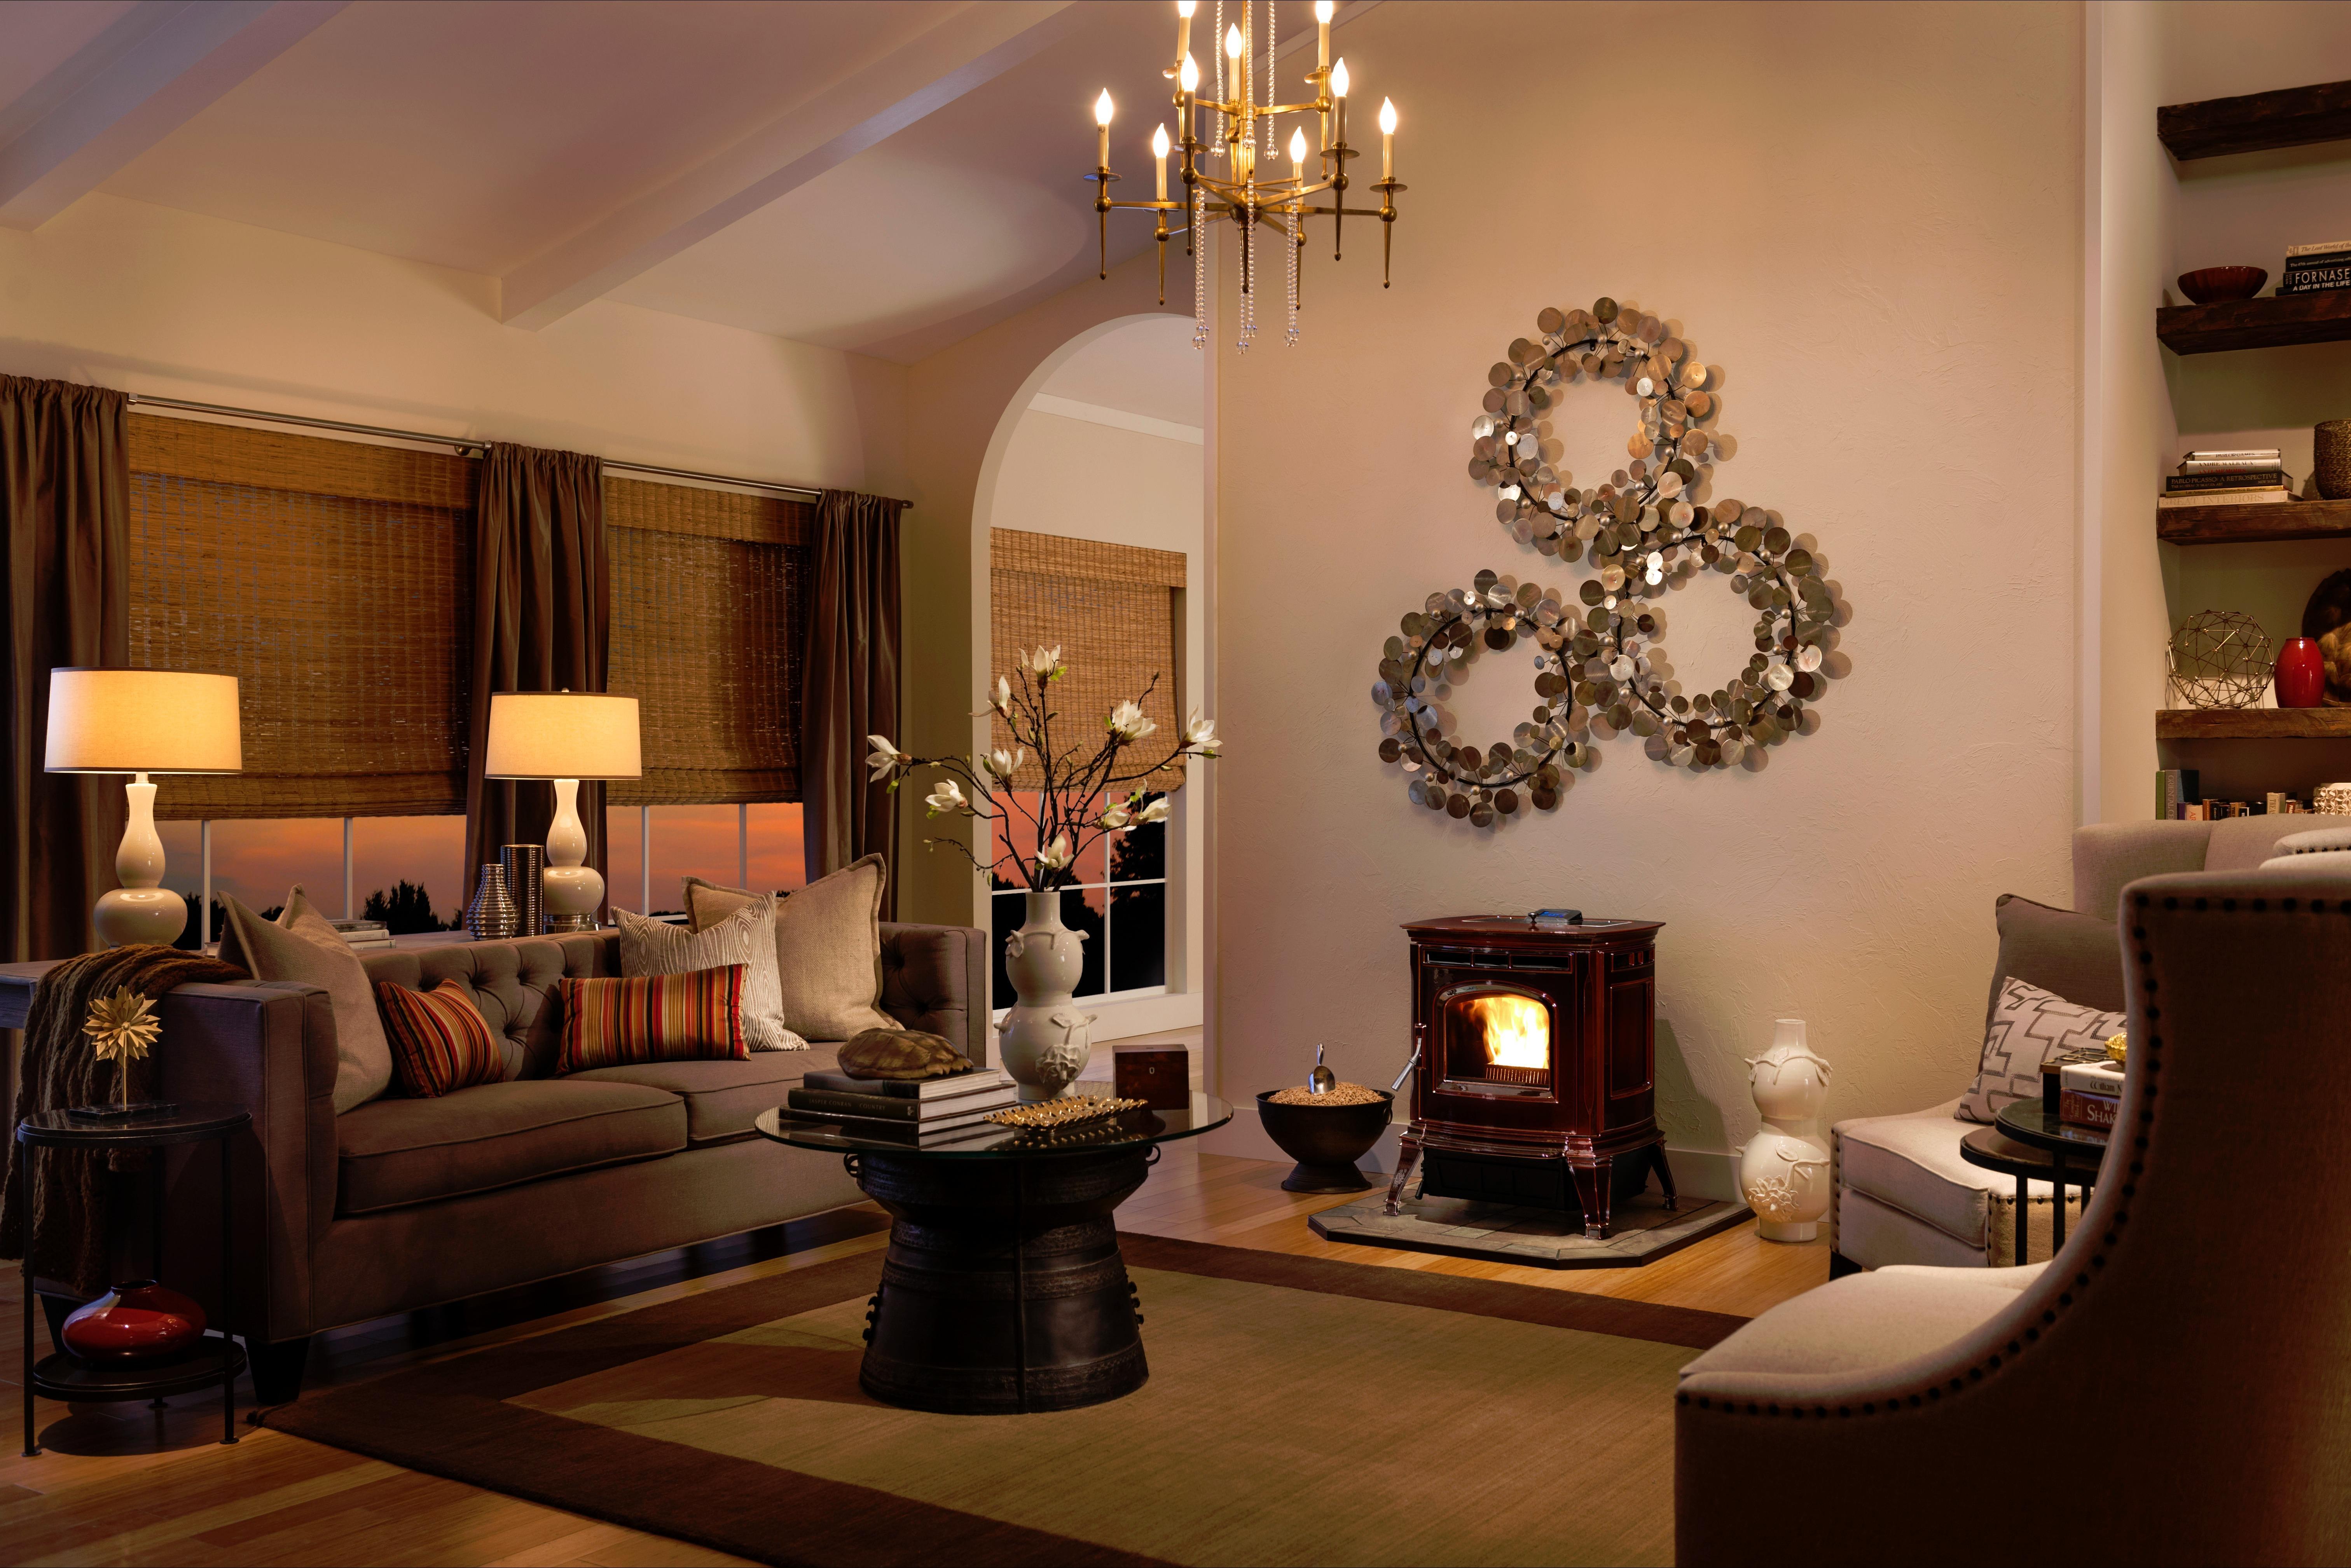 Fireside Hearth & Home image 1